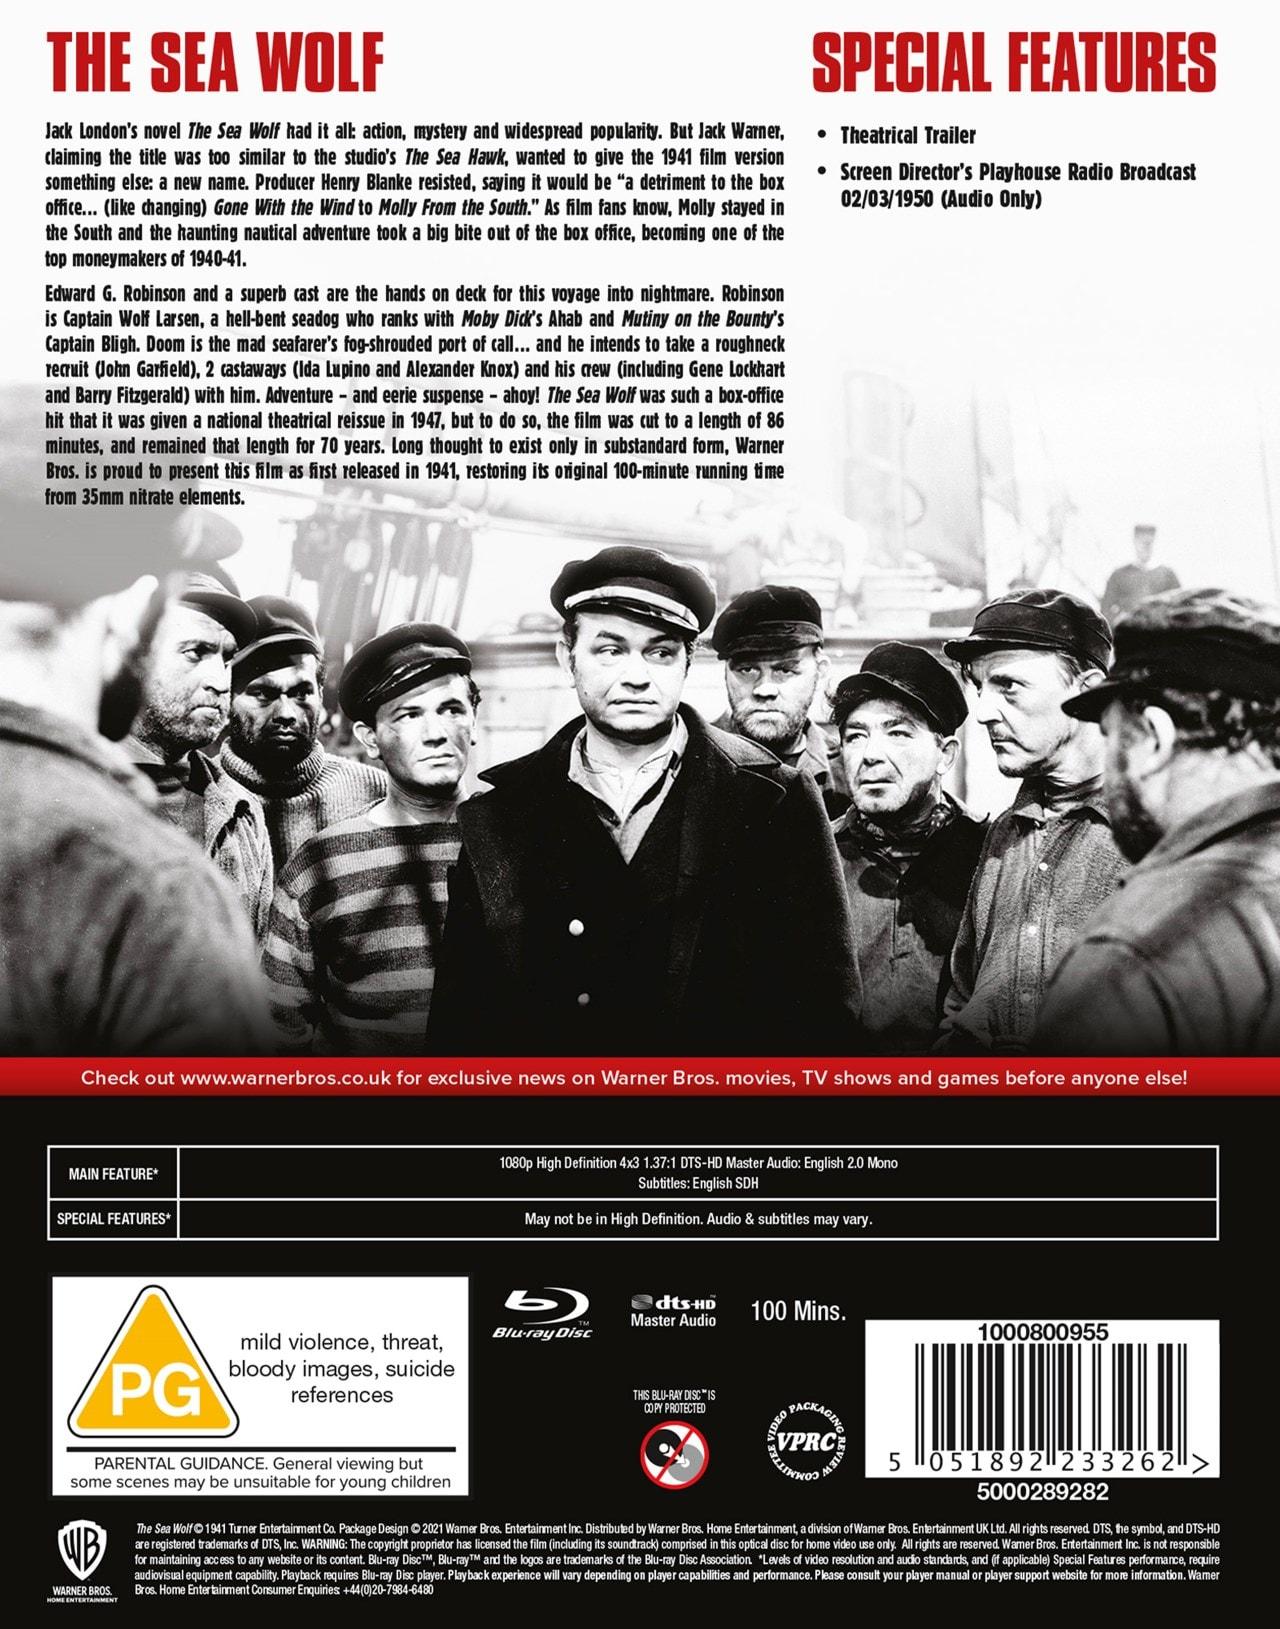 The Sea Wolf (hmv Exclusive) - The Premium Collection - 3